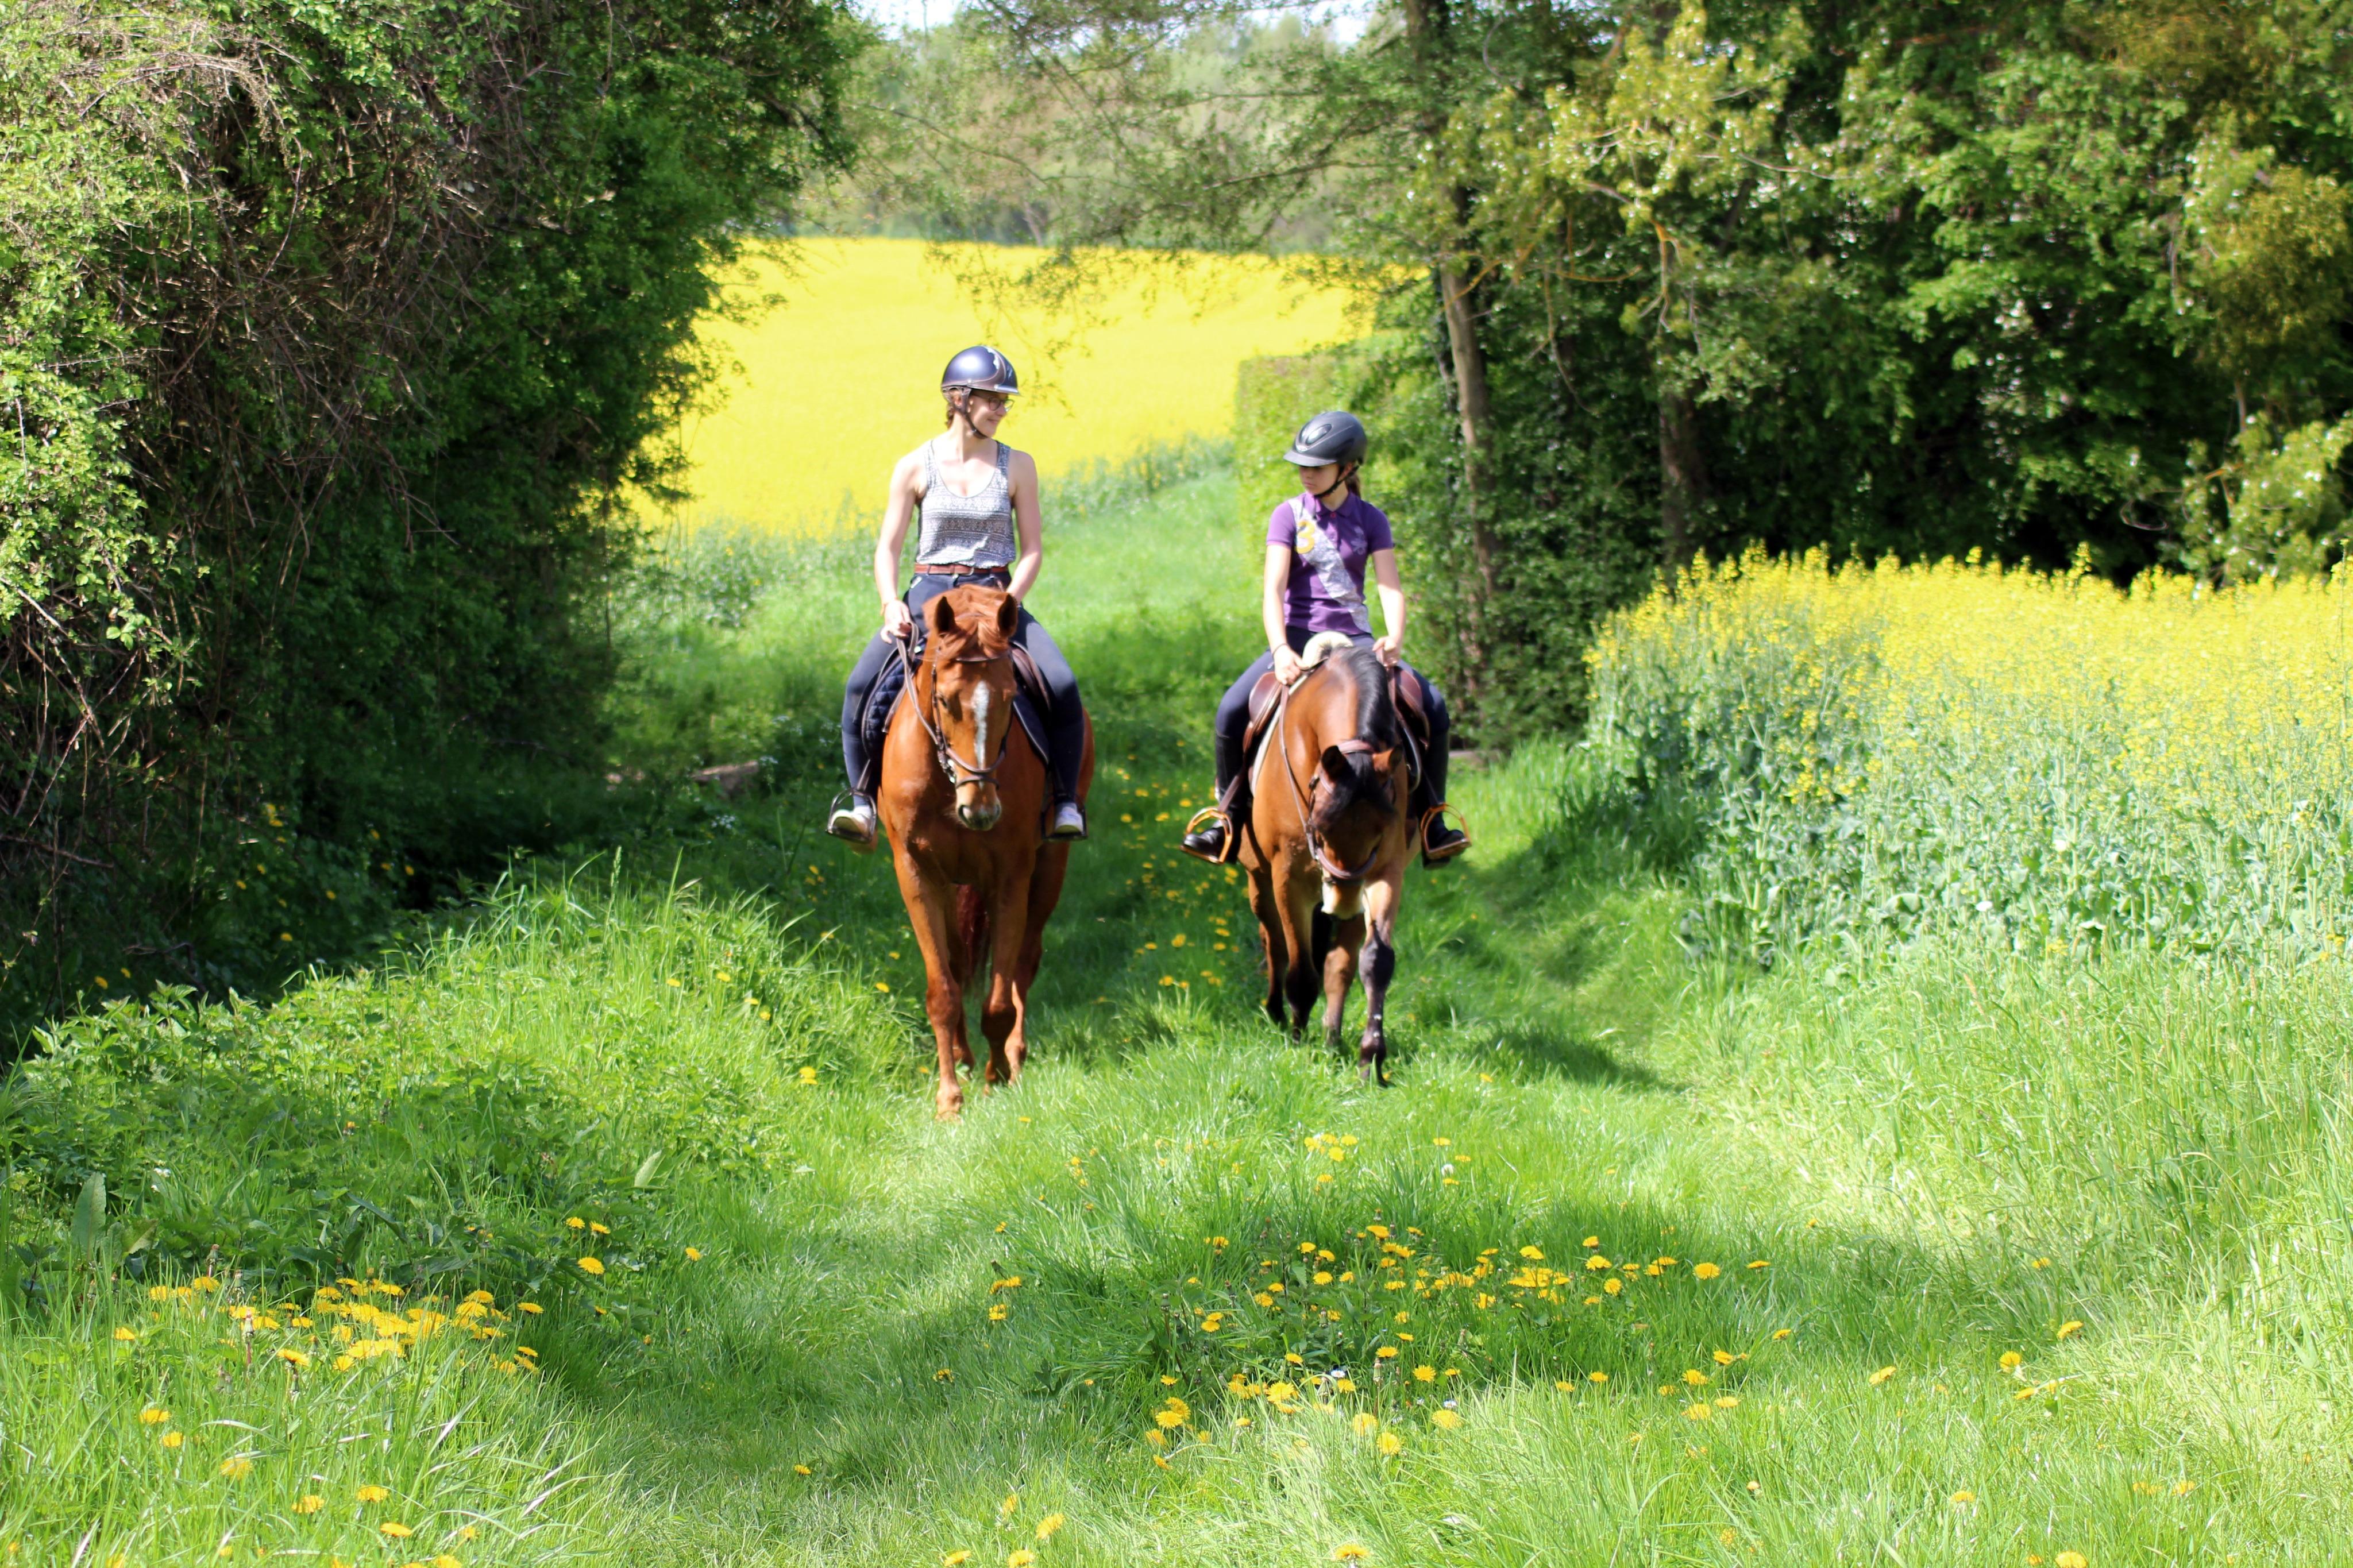 les petites ecuries loisir balade en foret equitation